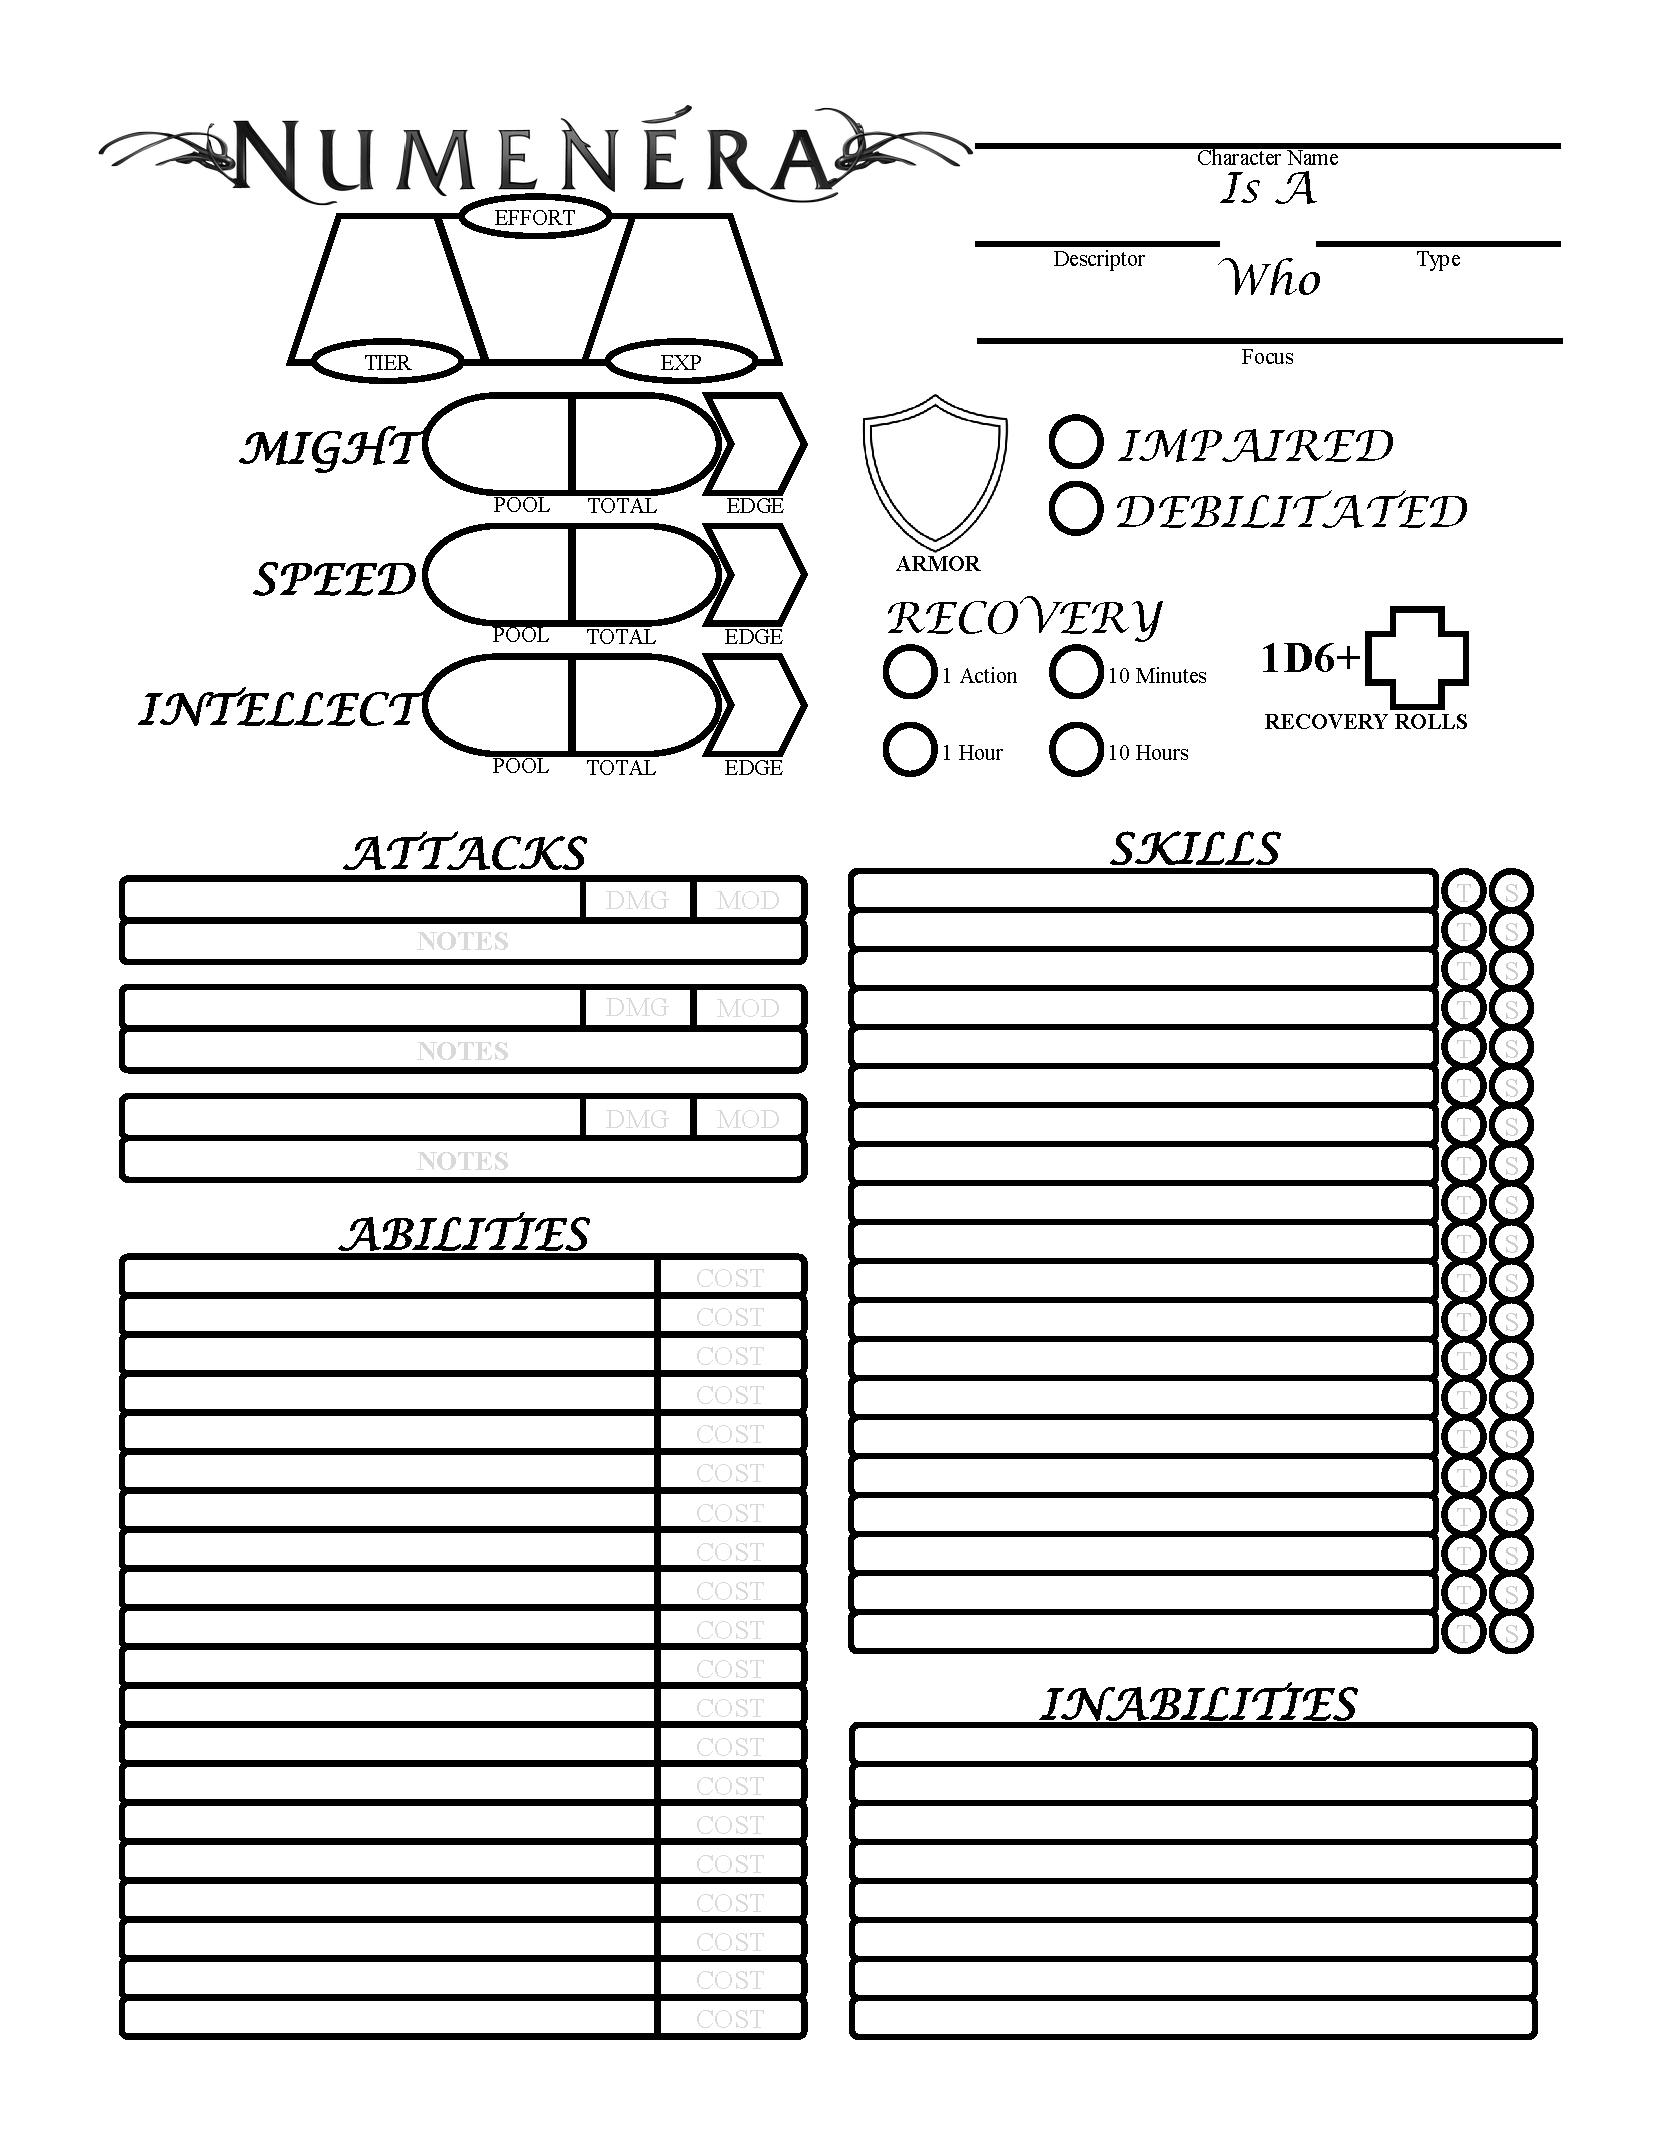 Let's talk character sheets  : rpg